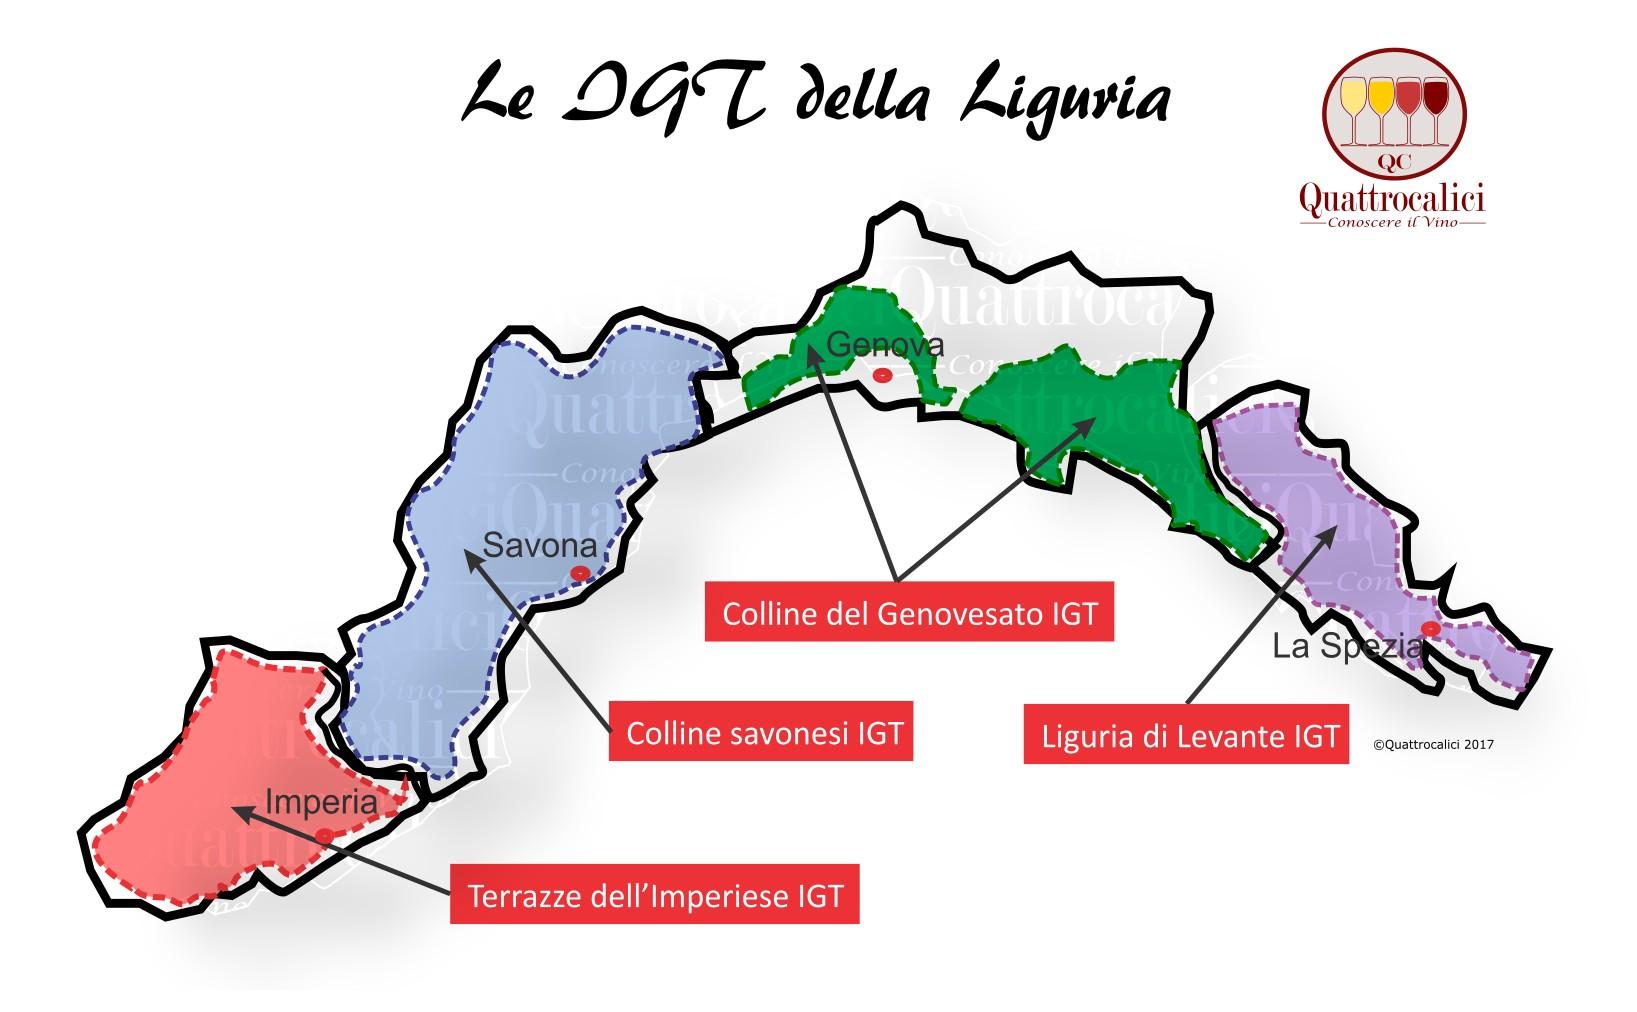 Le IGT della Liguria